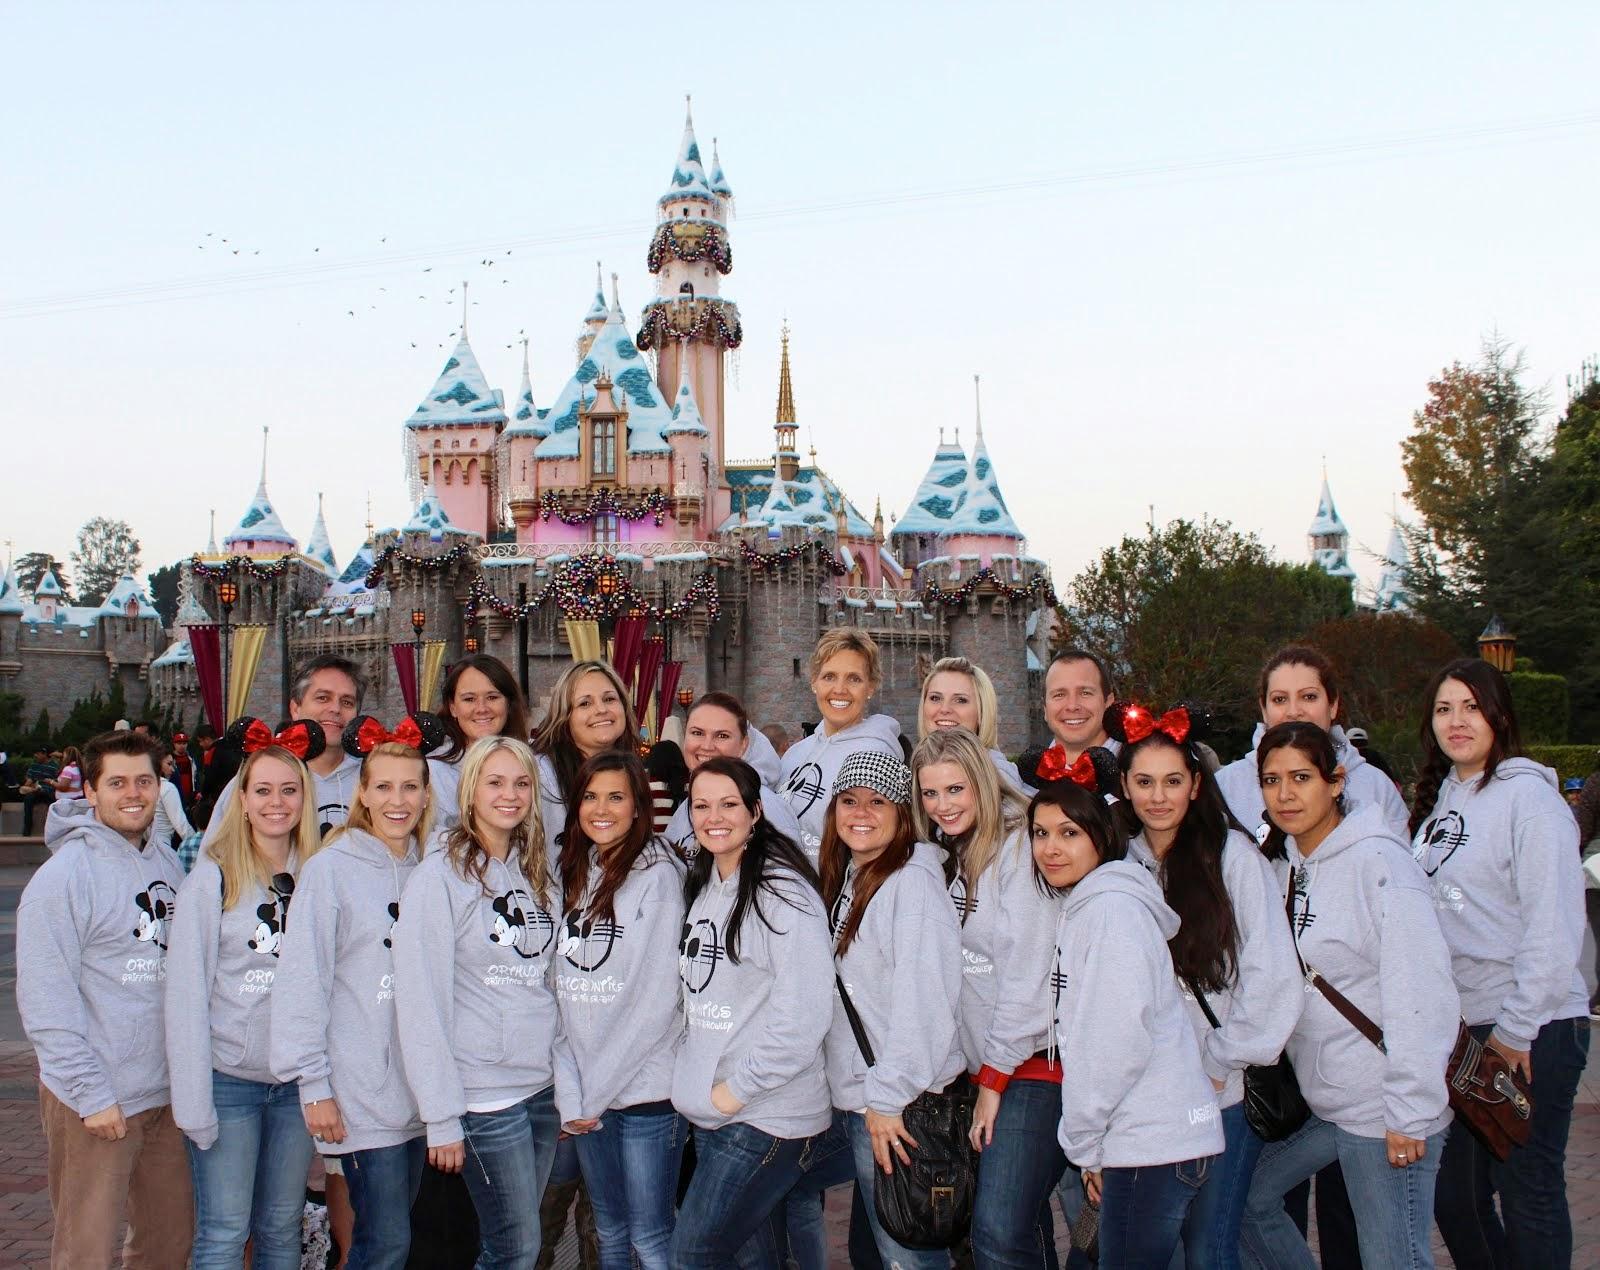 Disneyland Fun 2012!